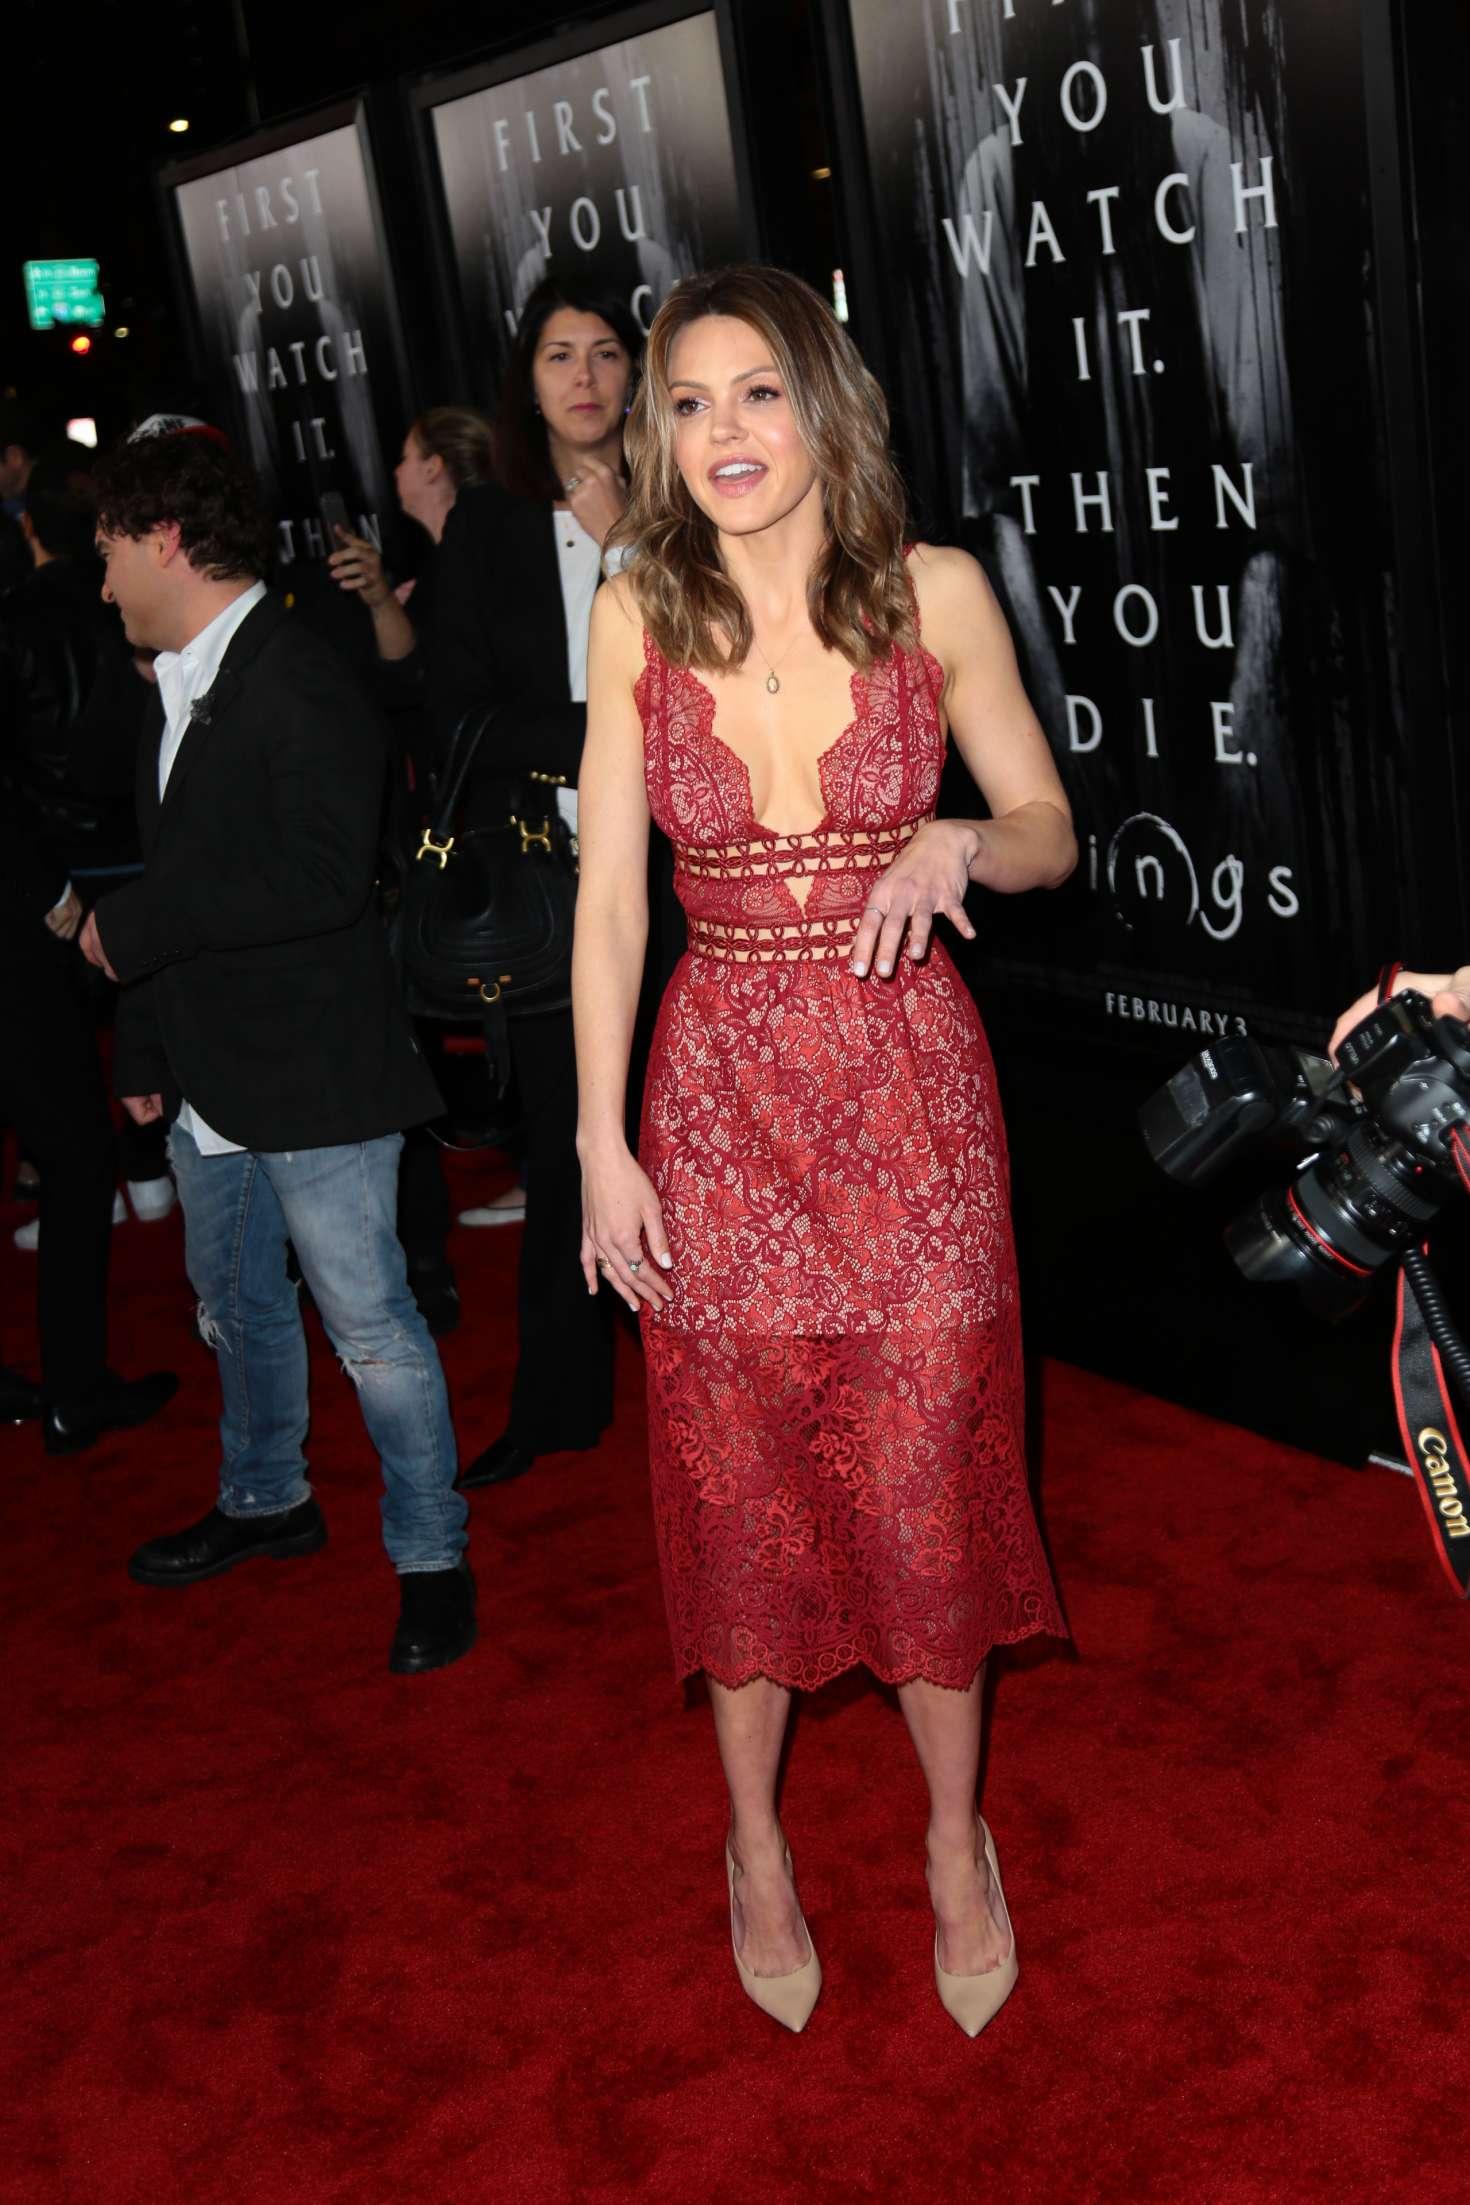 Aimee Teegarden 2017 : Aimee Teegarden: Rings LA Premiere -33